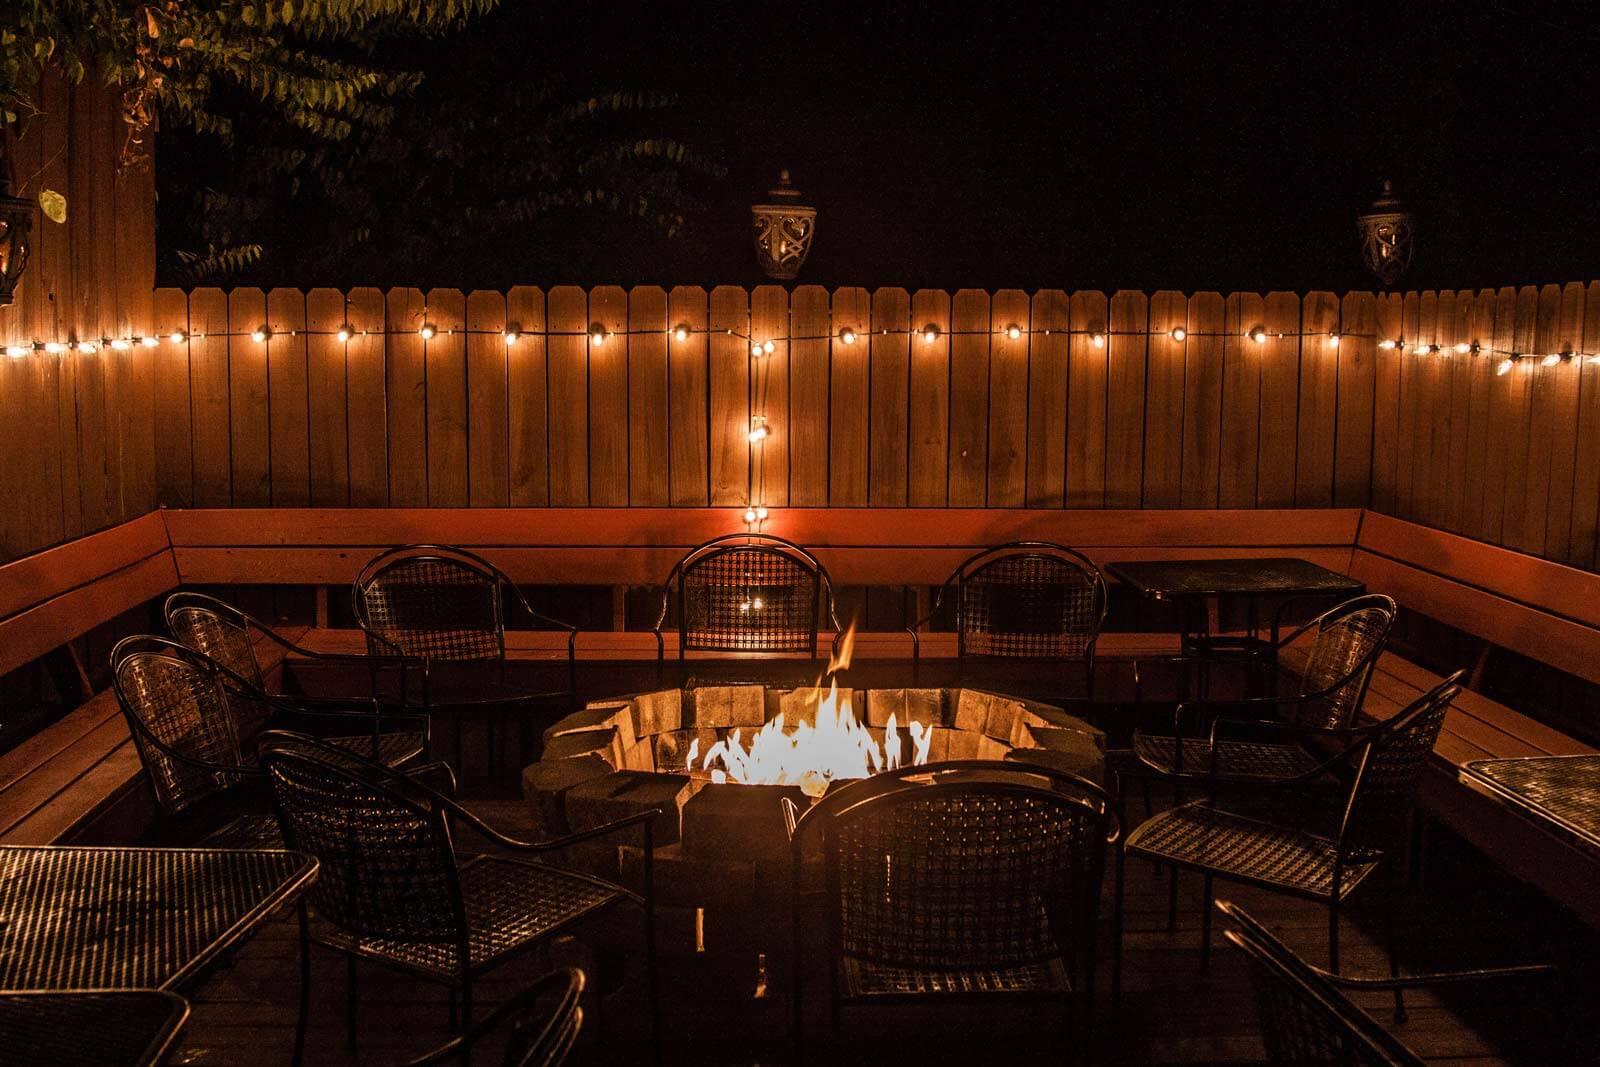 Mafiaozas-pizzeria-outdoor-fire-pit-seating.jpg